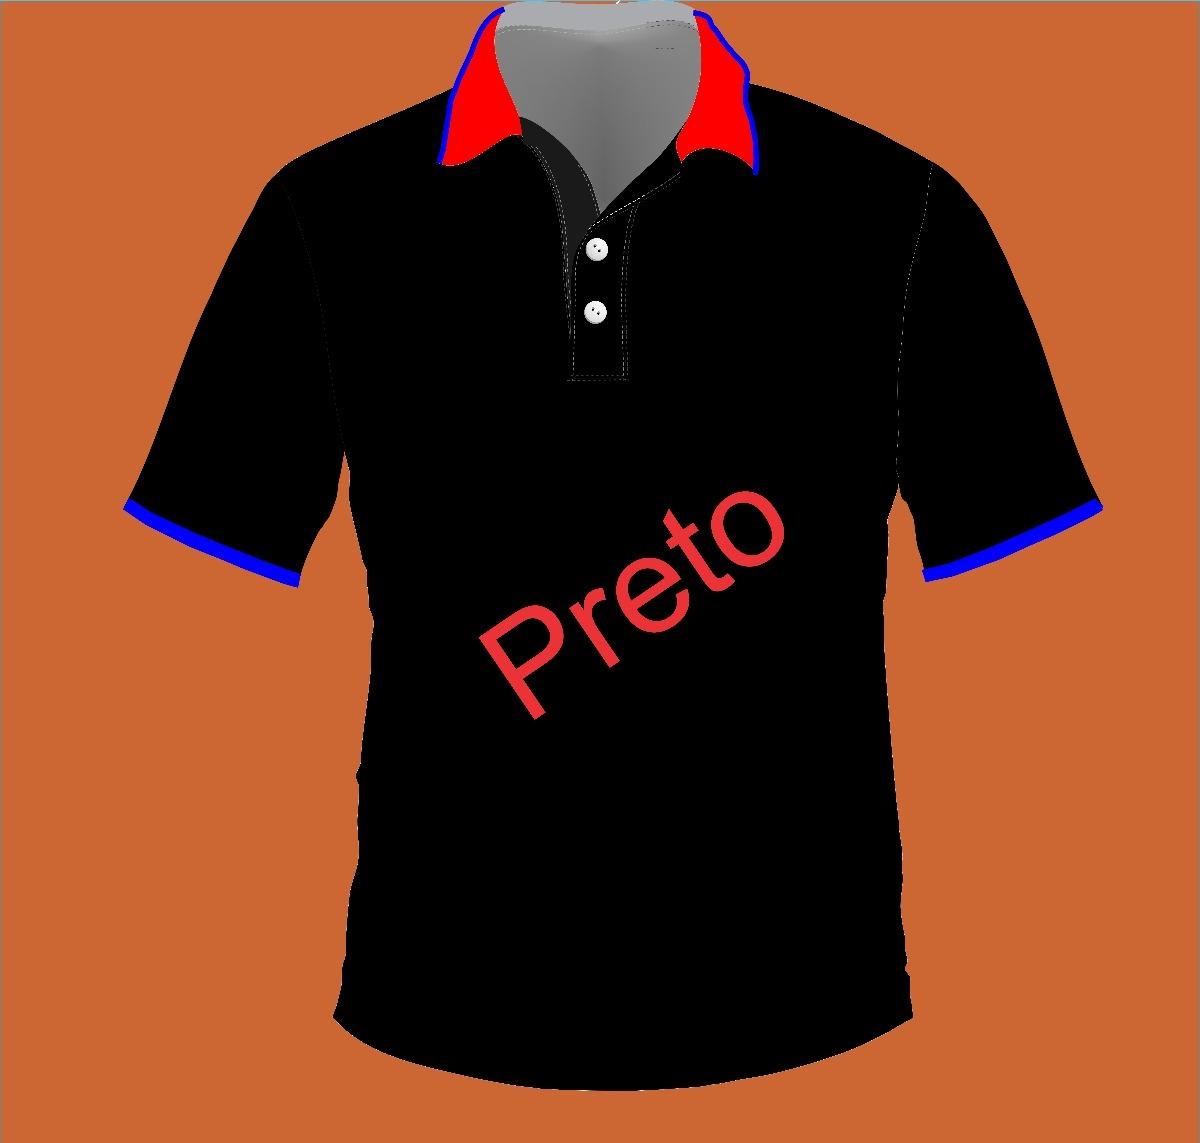 5bf67a808c 10 camiseta polo personalizada uniforme. Carregando zoom... 4